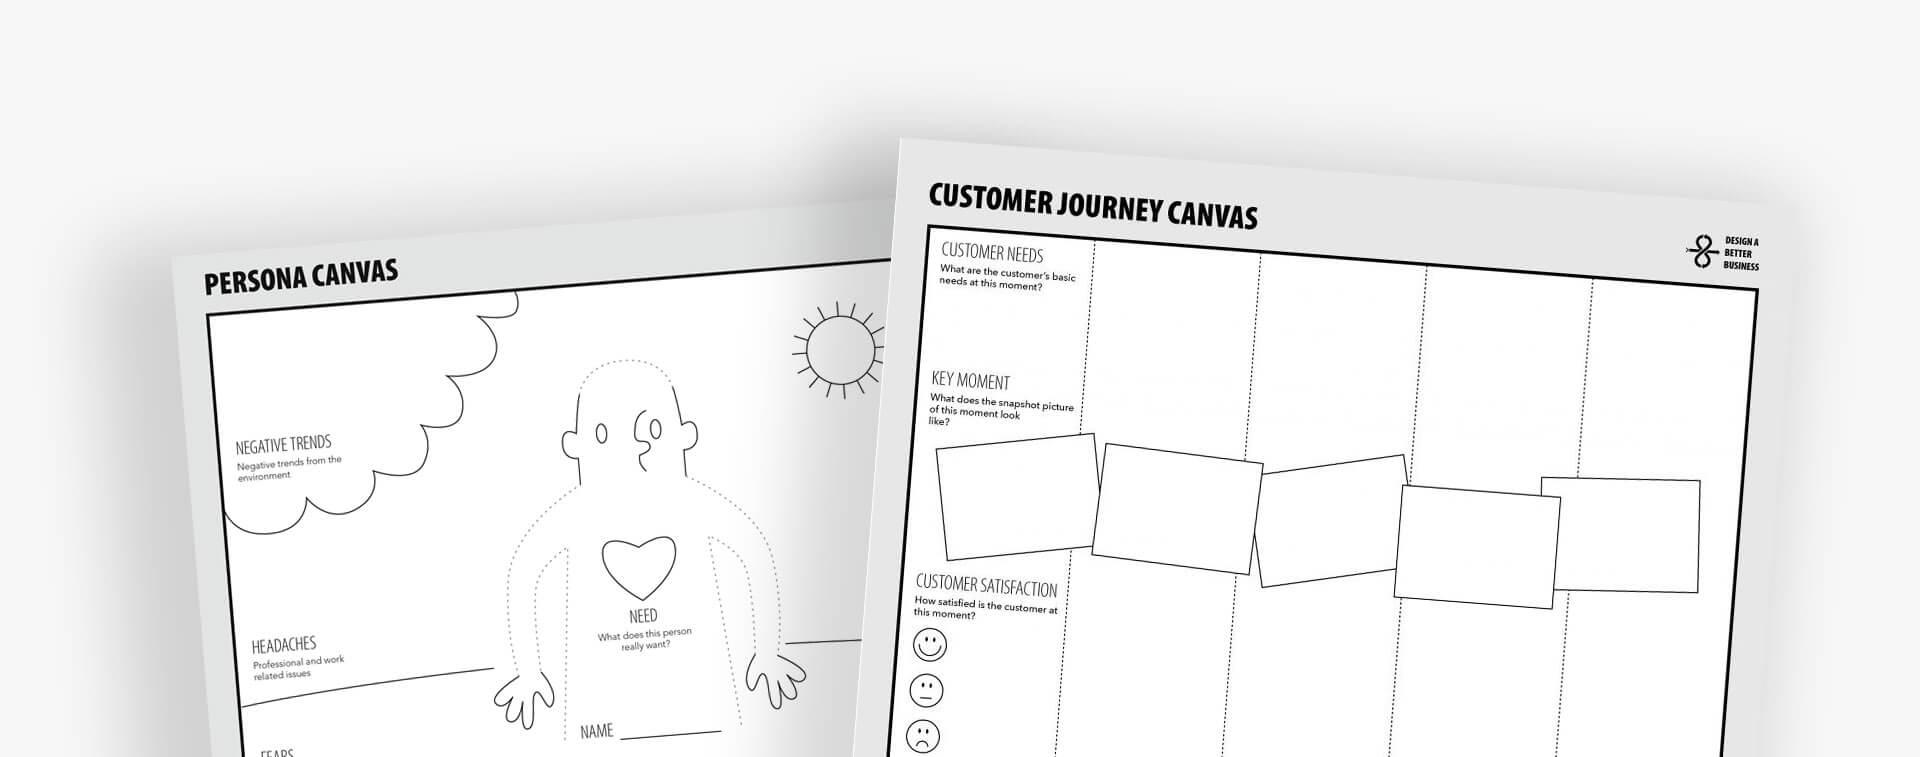 contentmarketing customer journey